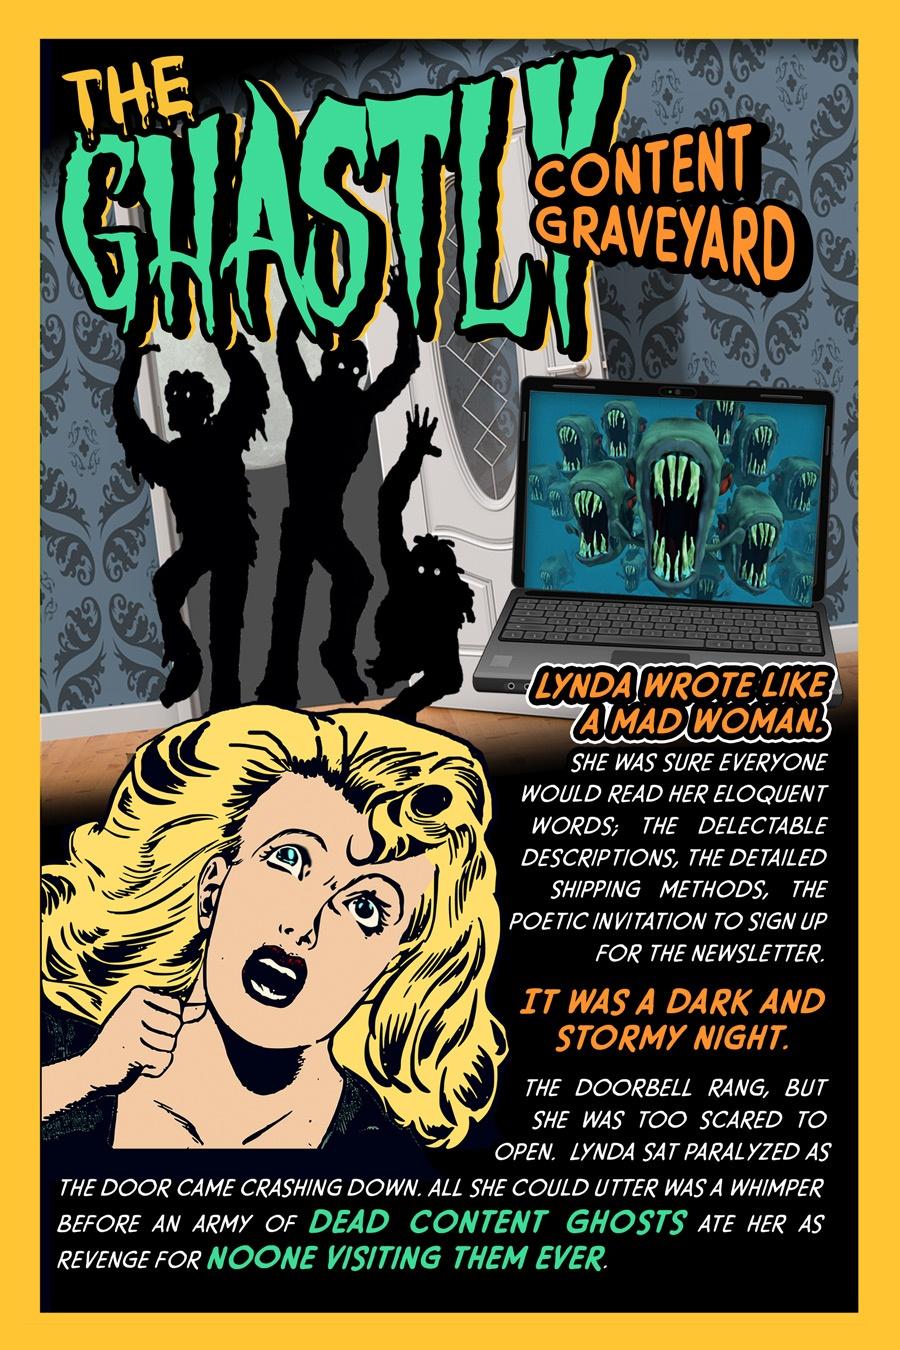 HalloweenPostcard-3-GhastlyContent-01.jpg